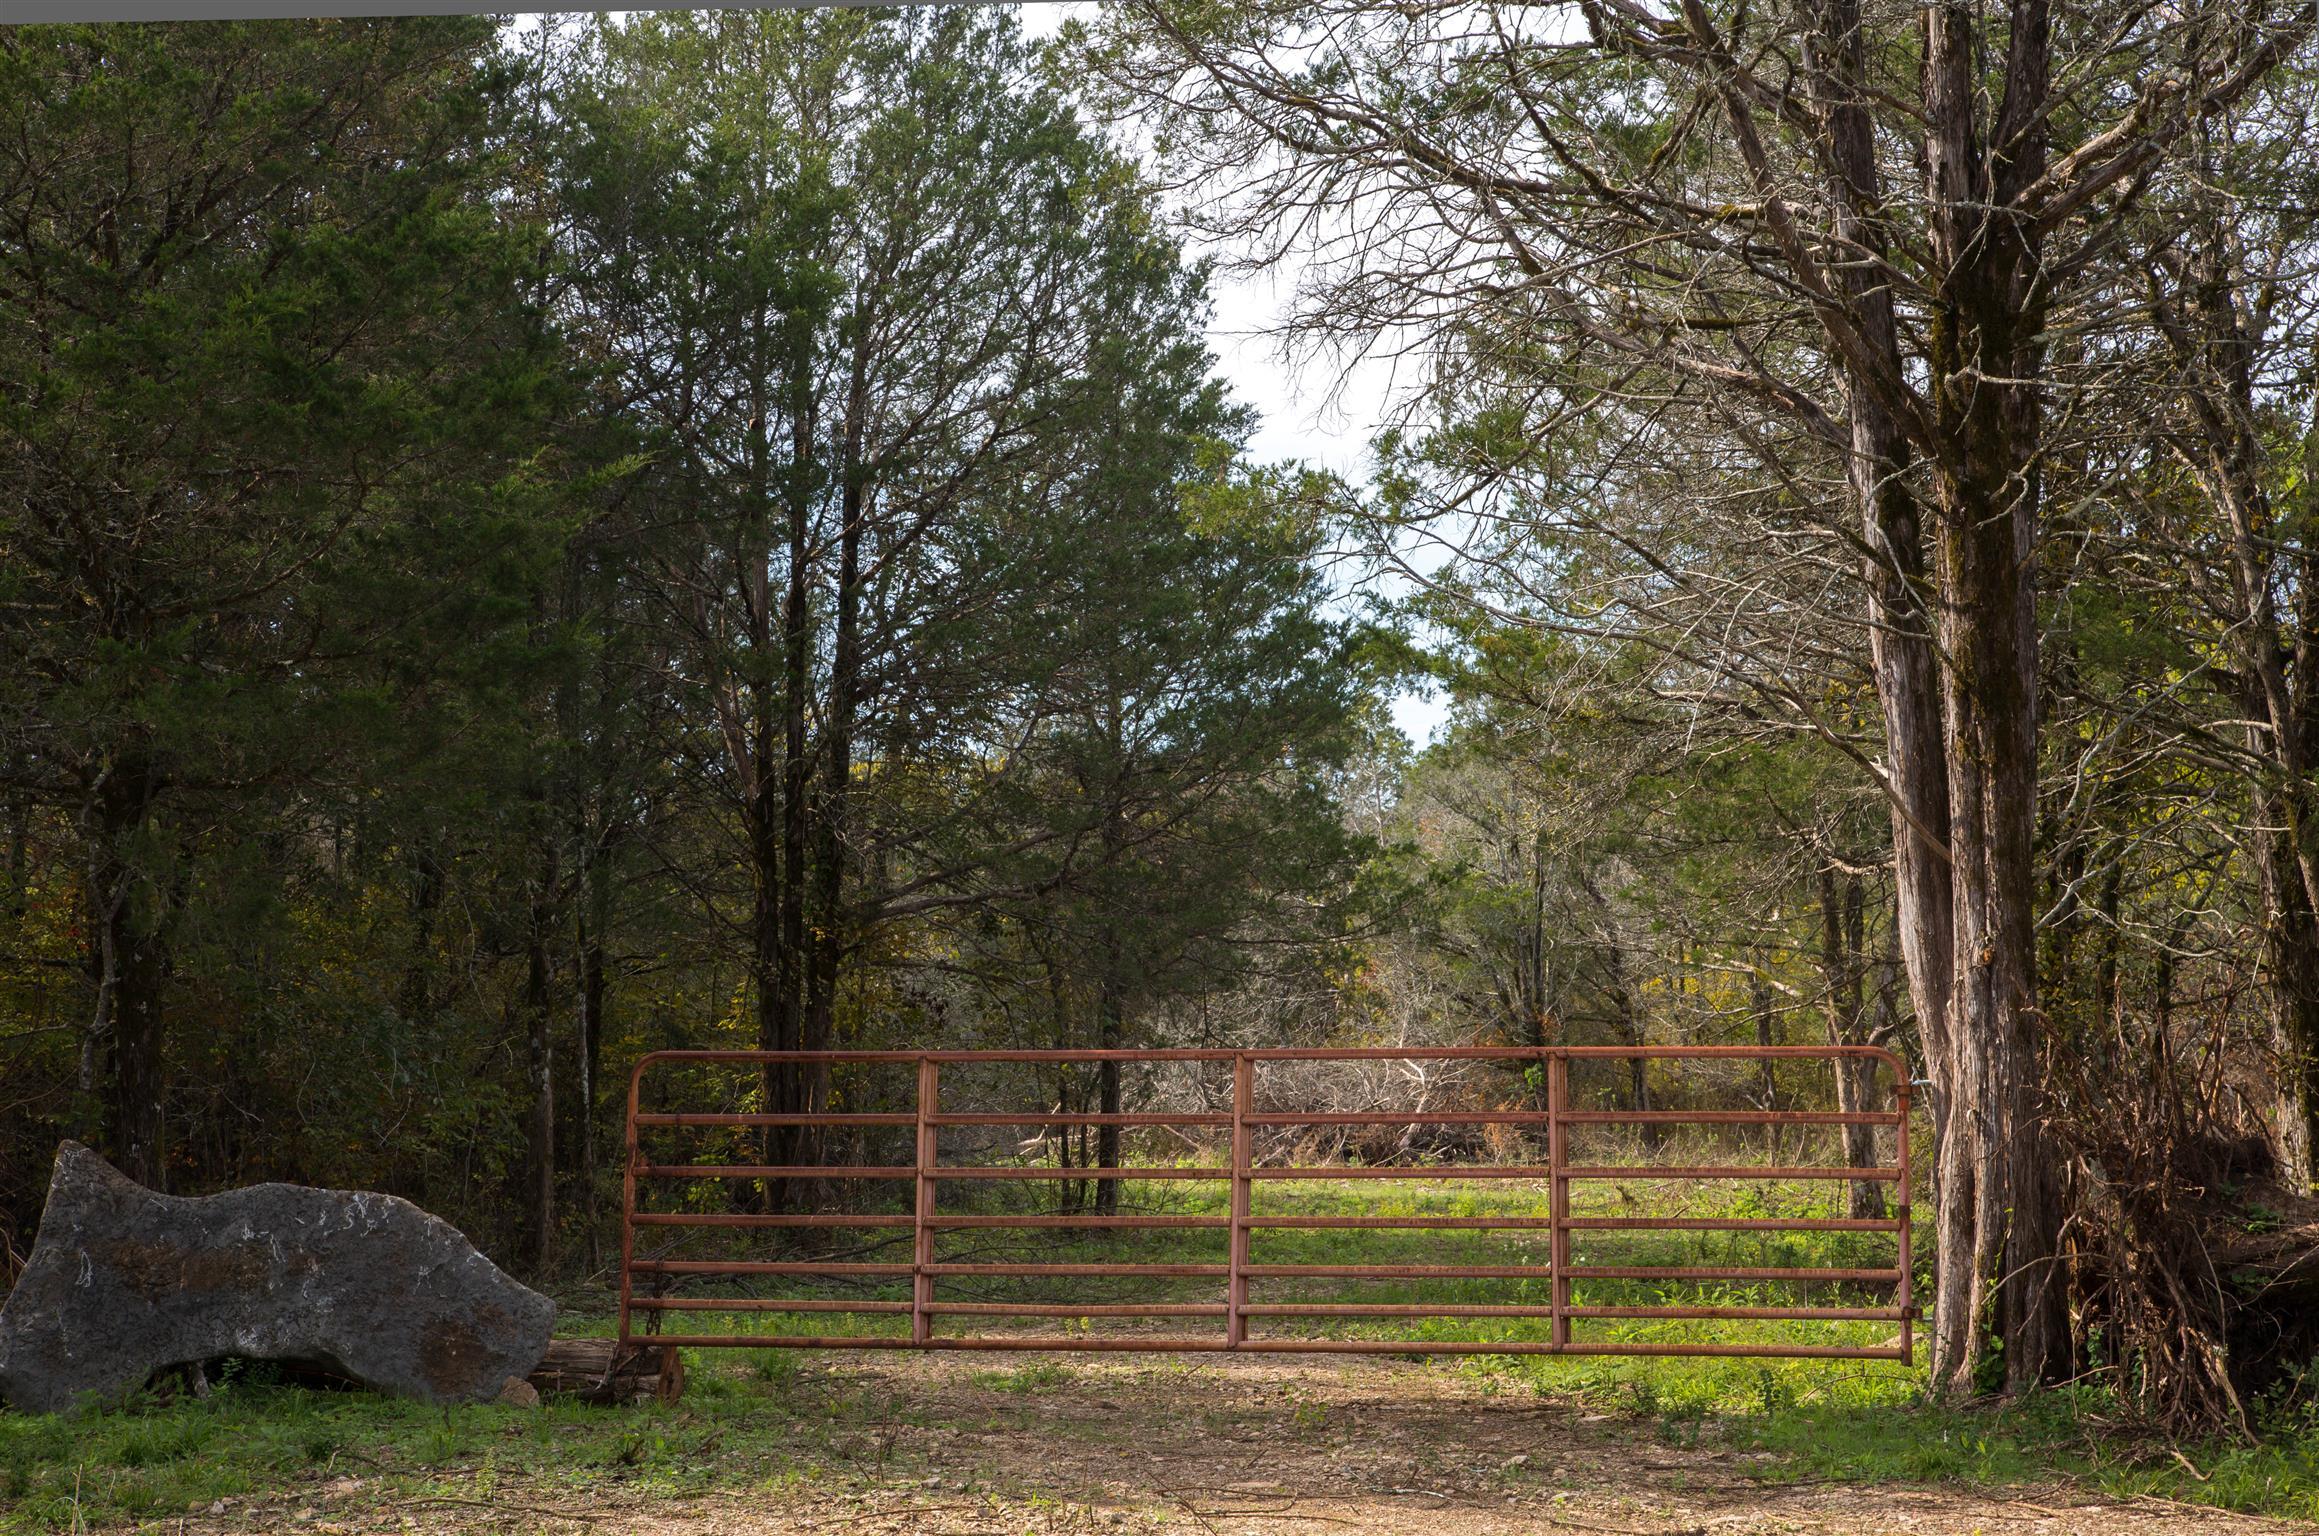 0 Whitus Road, Murfreesboro, TN 37128 - Murfreesboro, TN real estate listing